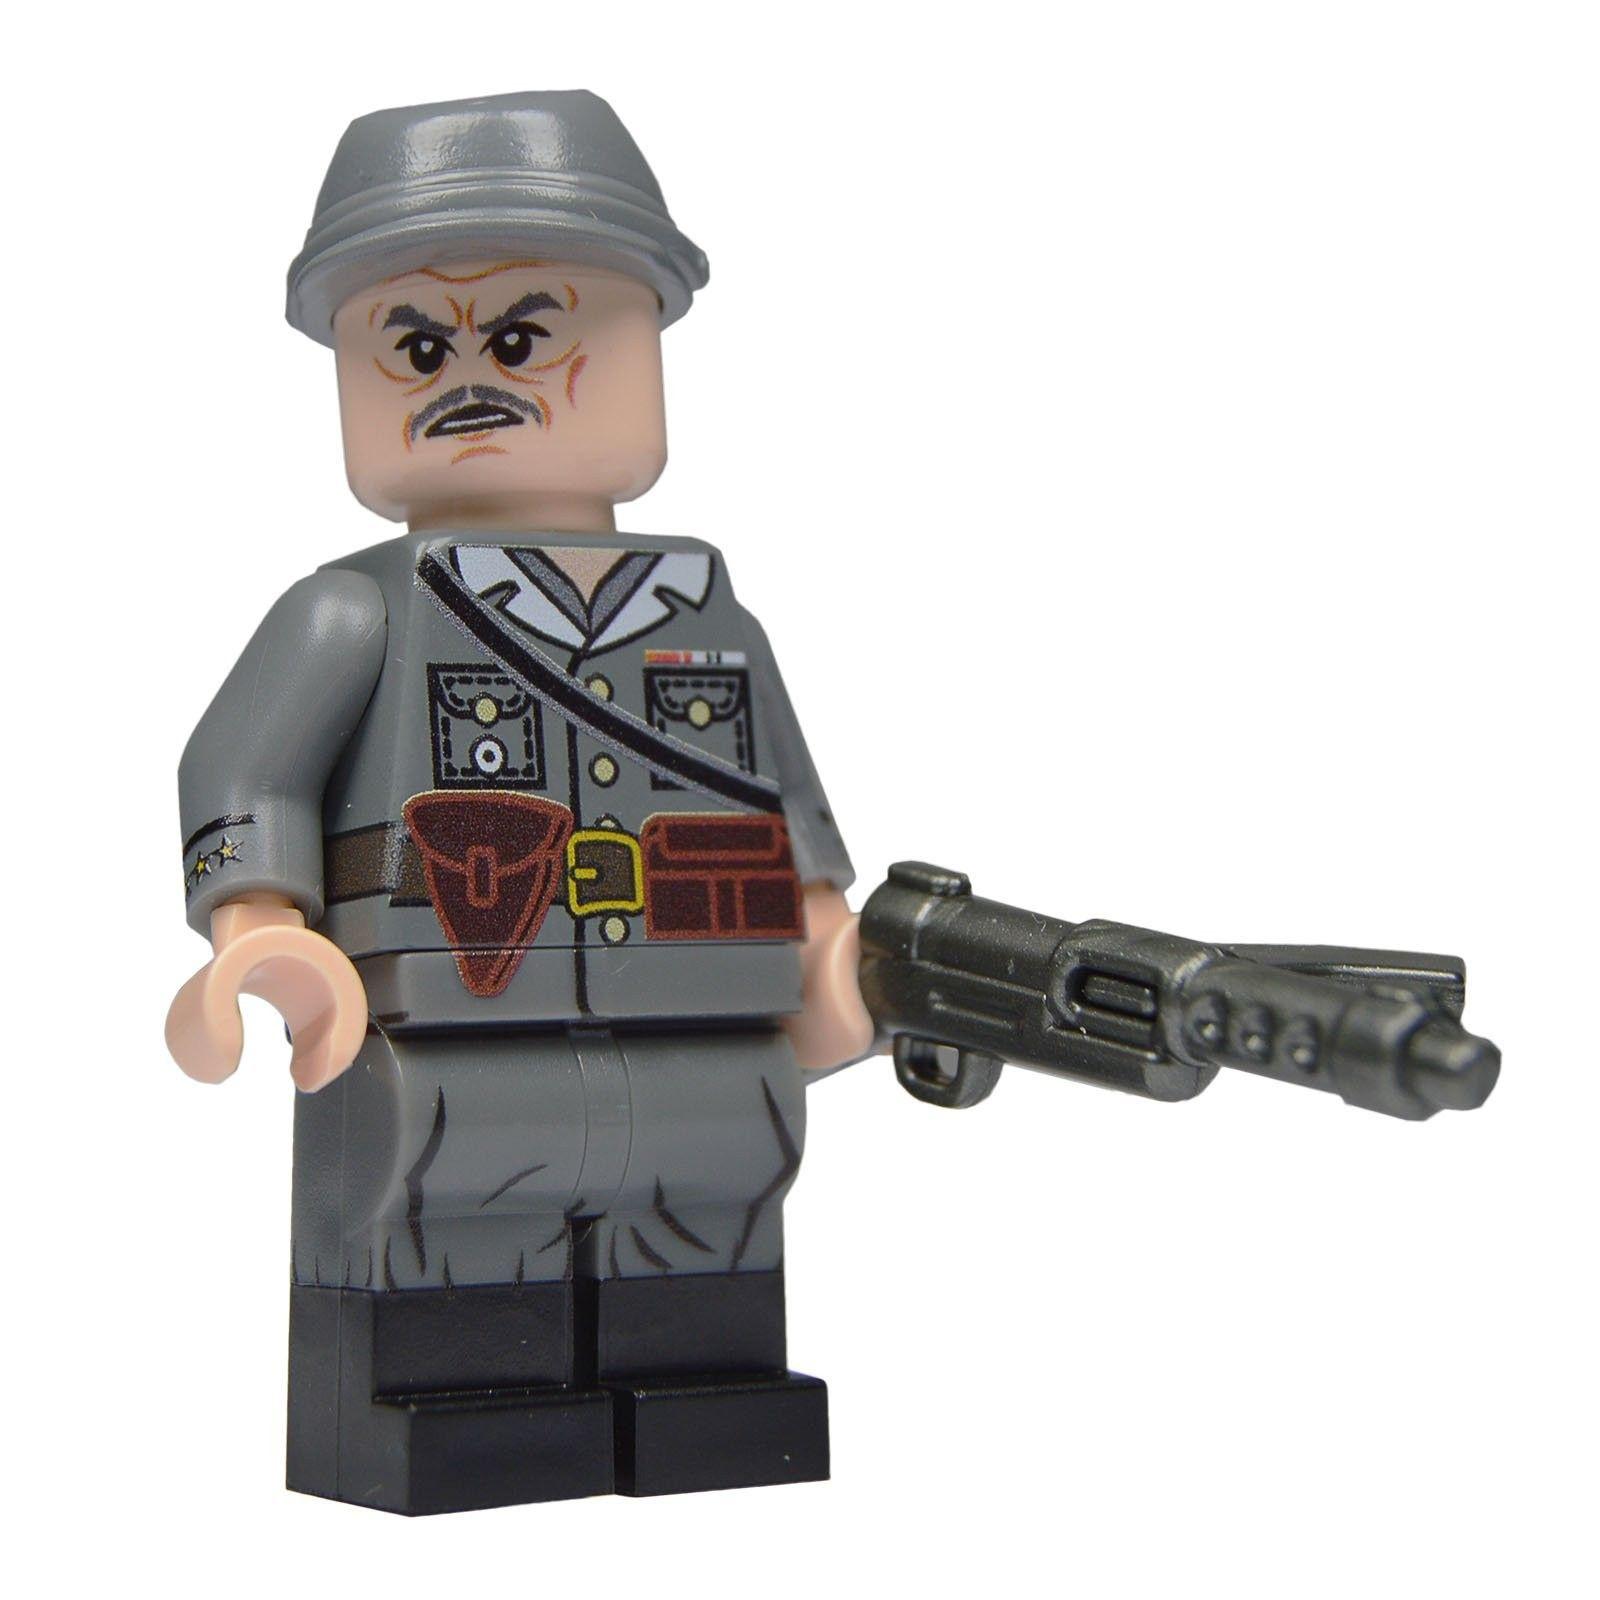 LEGO® brick AMERICAN REVOLUTION custom American RIFLEMAN Minifigure Version 1